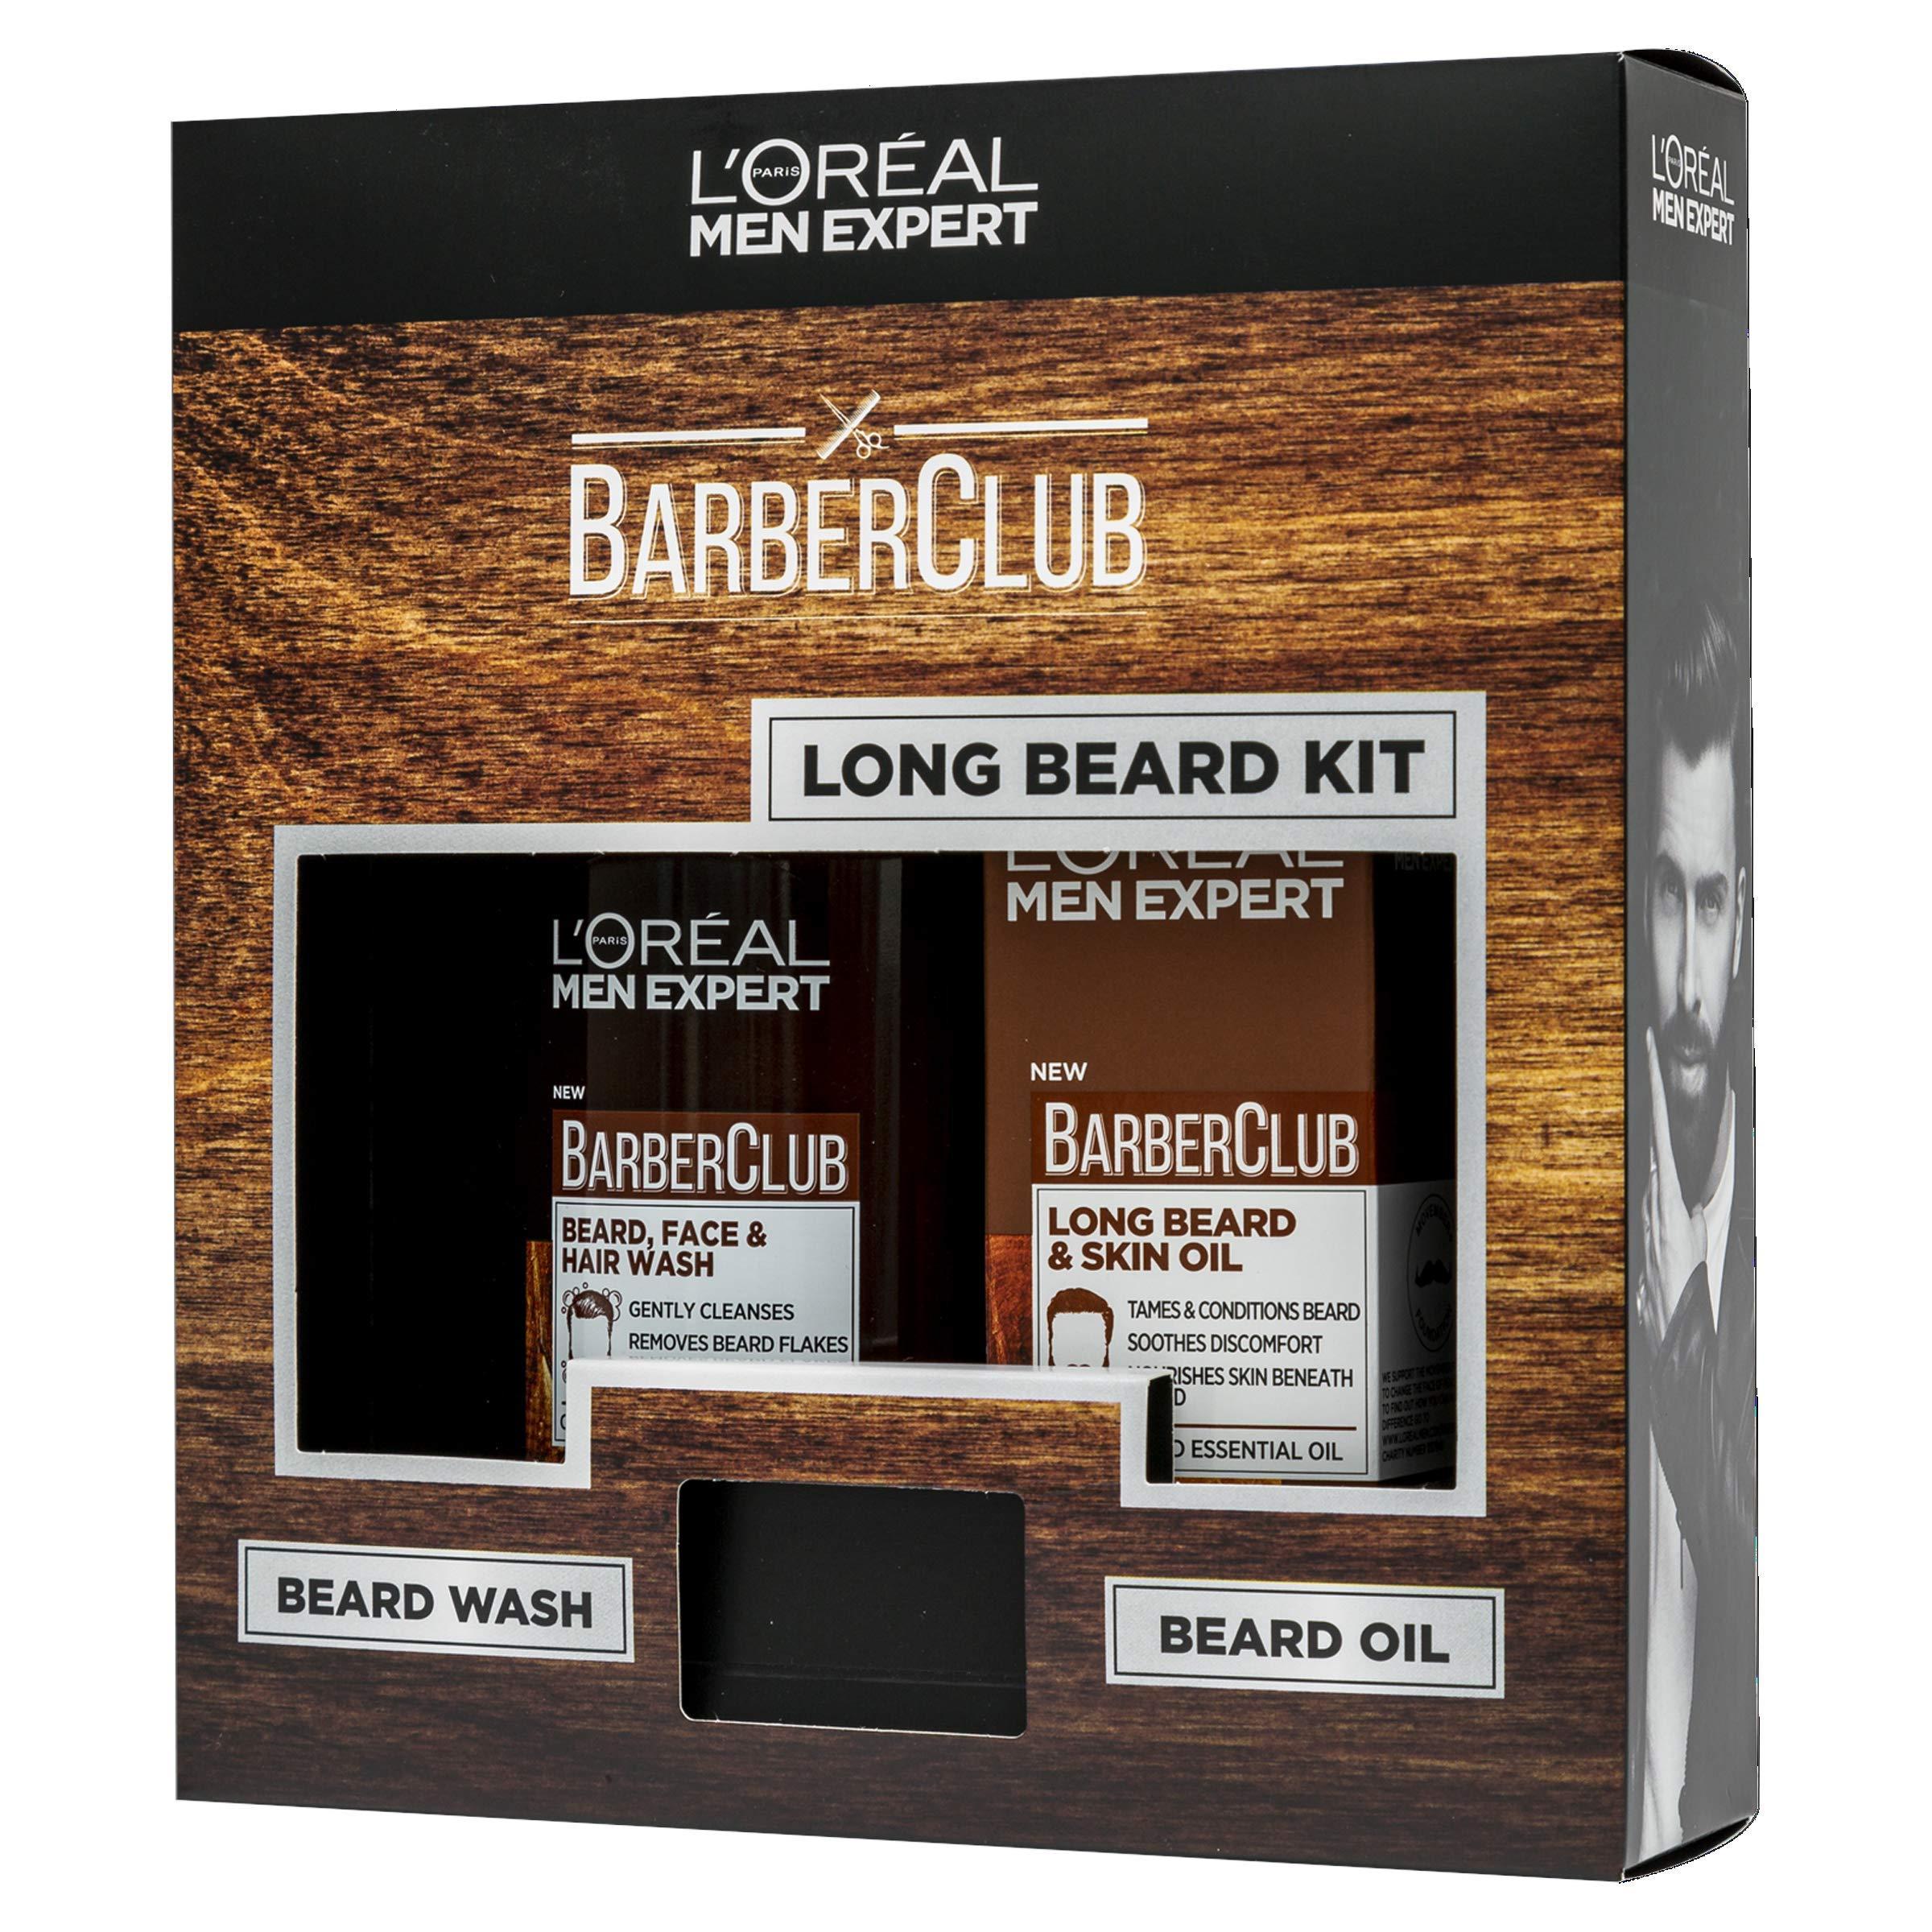 L'Oreal Men Expert Barberclub Long Beard Gift Set: Beard, Hair and Face Wash & Oil